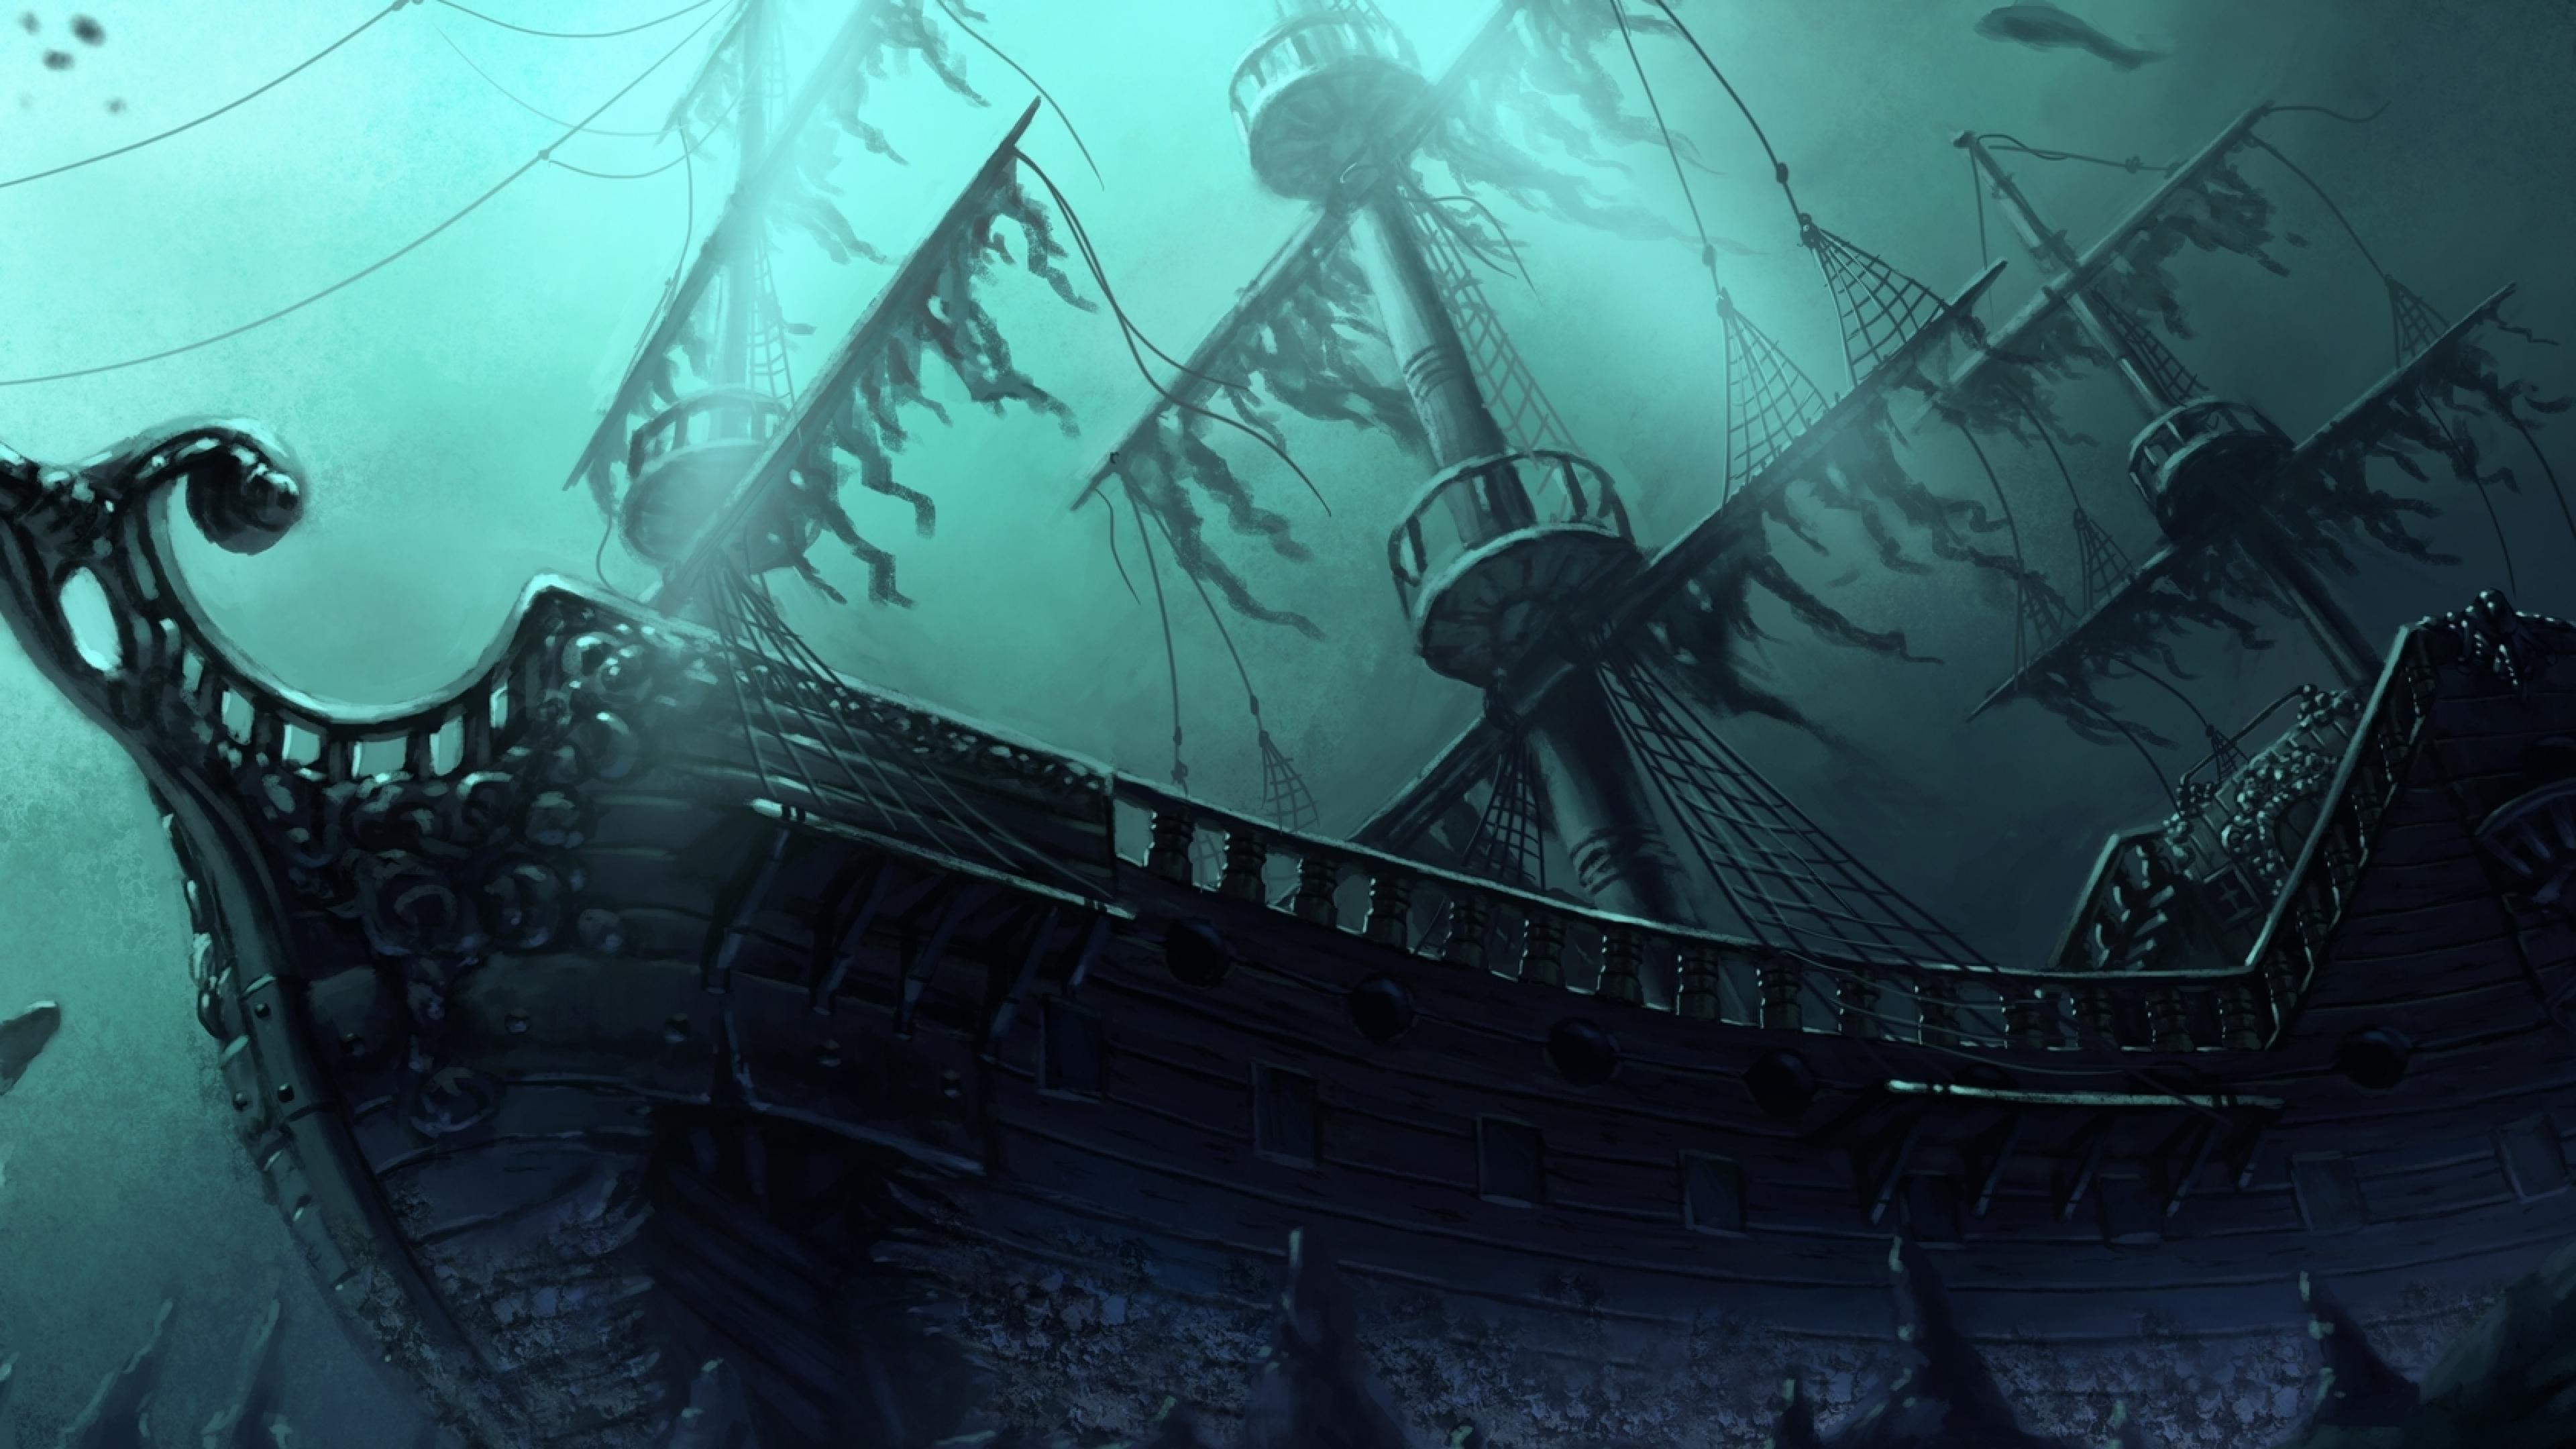 Sunken Ghost Pirate Ship Wallpaper by HD Wallpapers Daily | Pirate ship  drawing, Pirate ship, Sunken ship tattoo